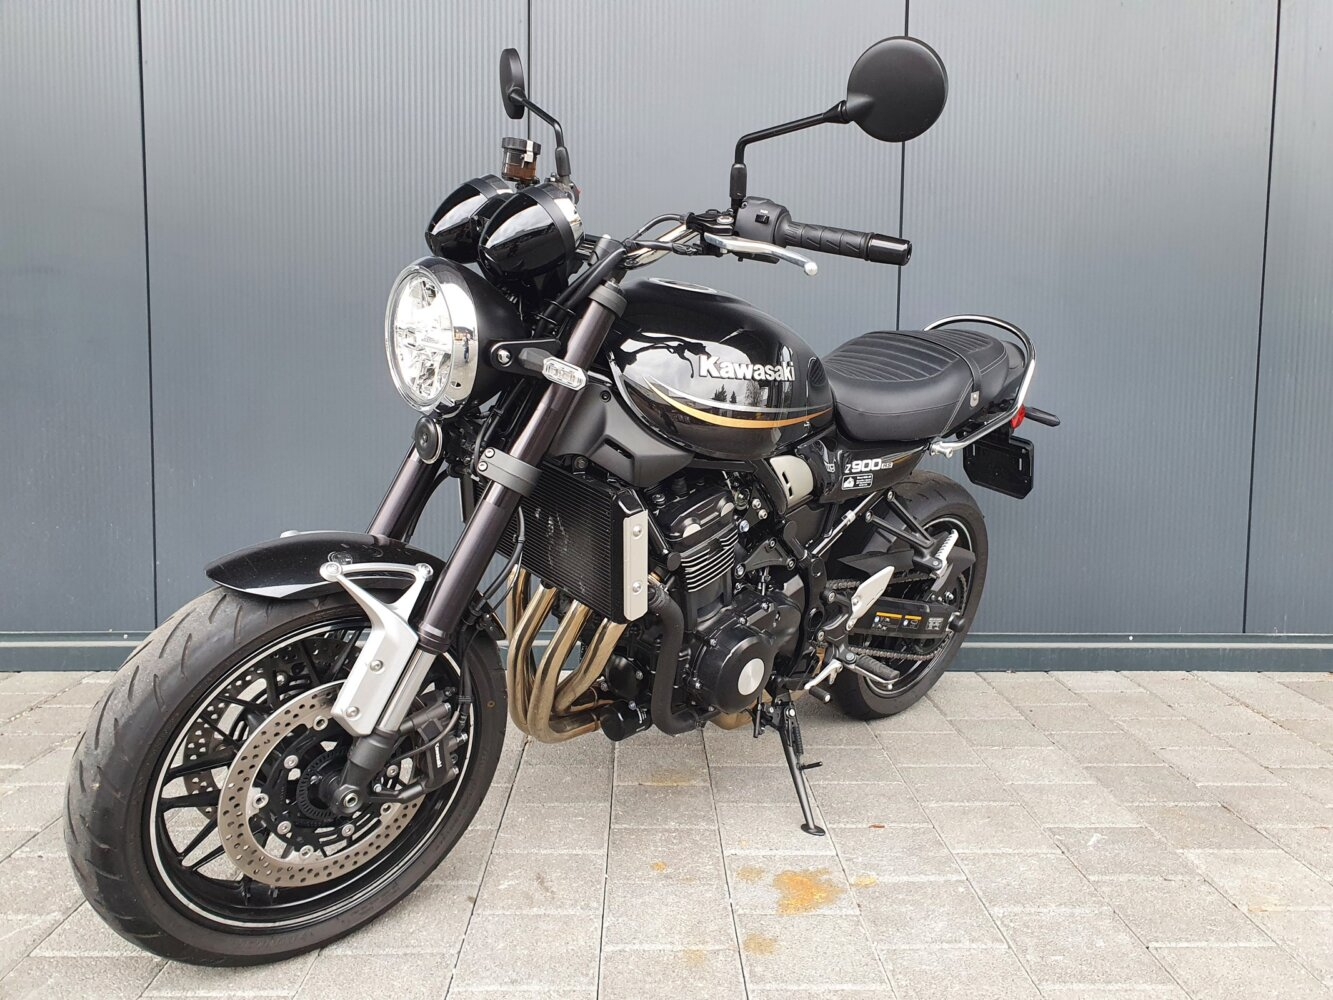 KAWASAKI Z 900 RS (Naked Bike)